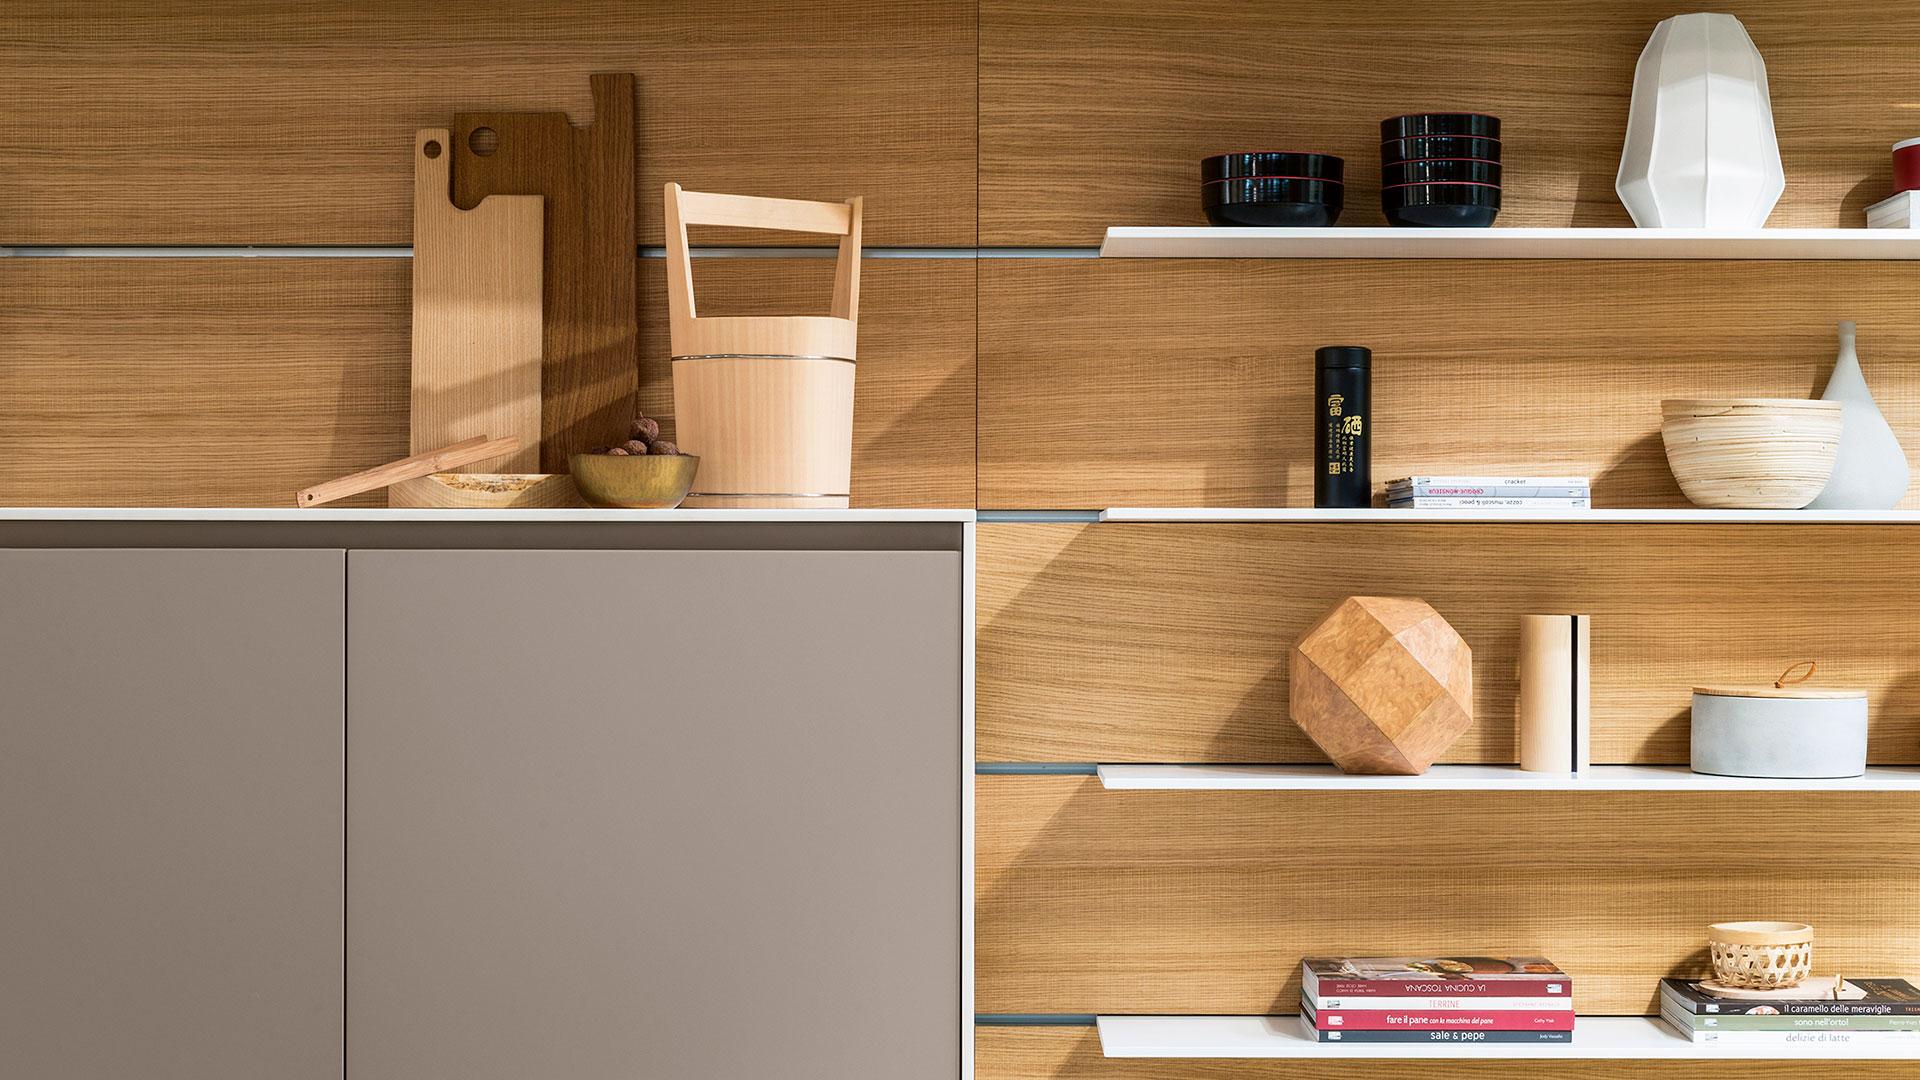 Cucina moderna freestanding in corian K6 | Collezioni Cucine 2018 TM Italia - TM_CAT_K6_005